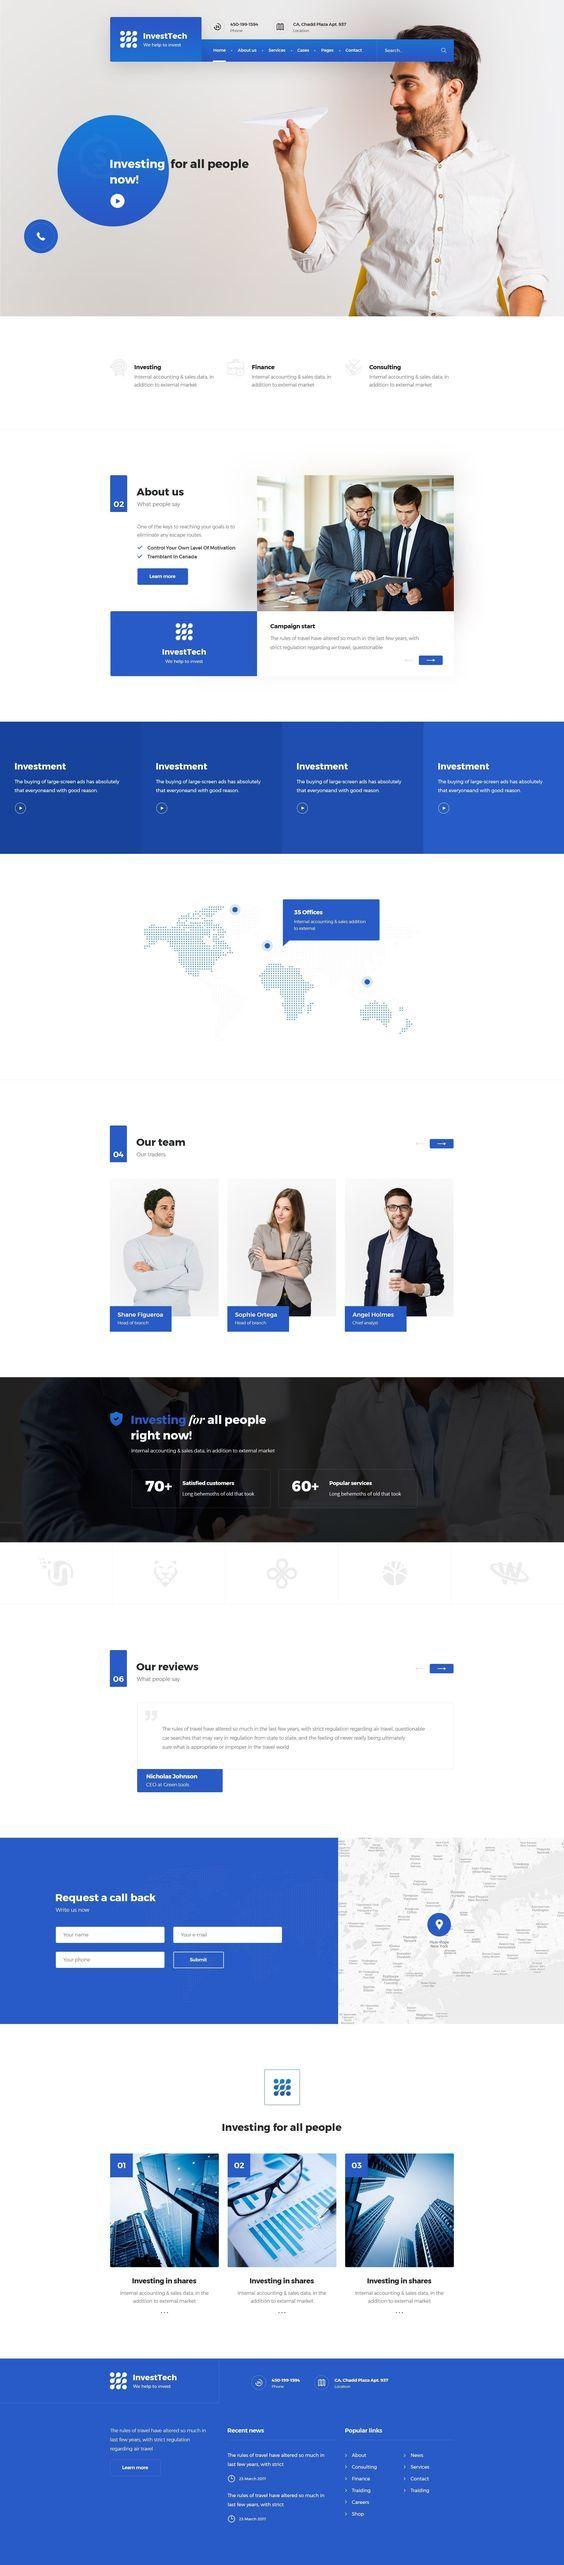 Pin By Alfredo On Dlya Raboty Web Layout Design Web Design Websites Web Template Design